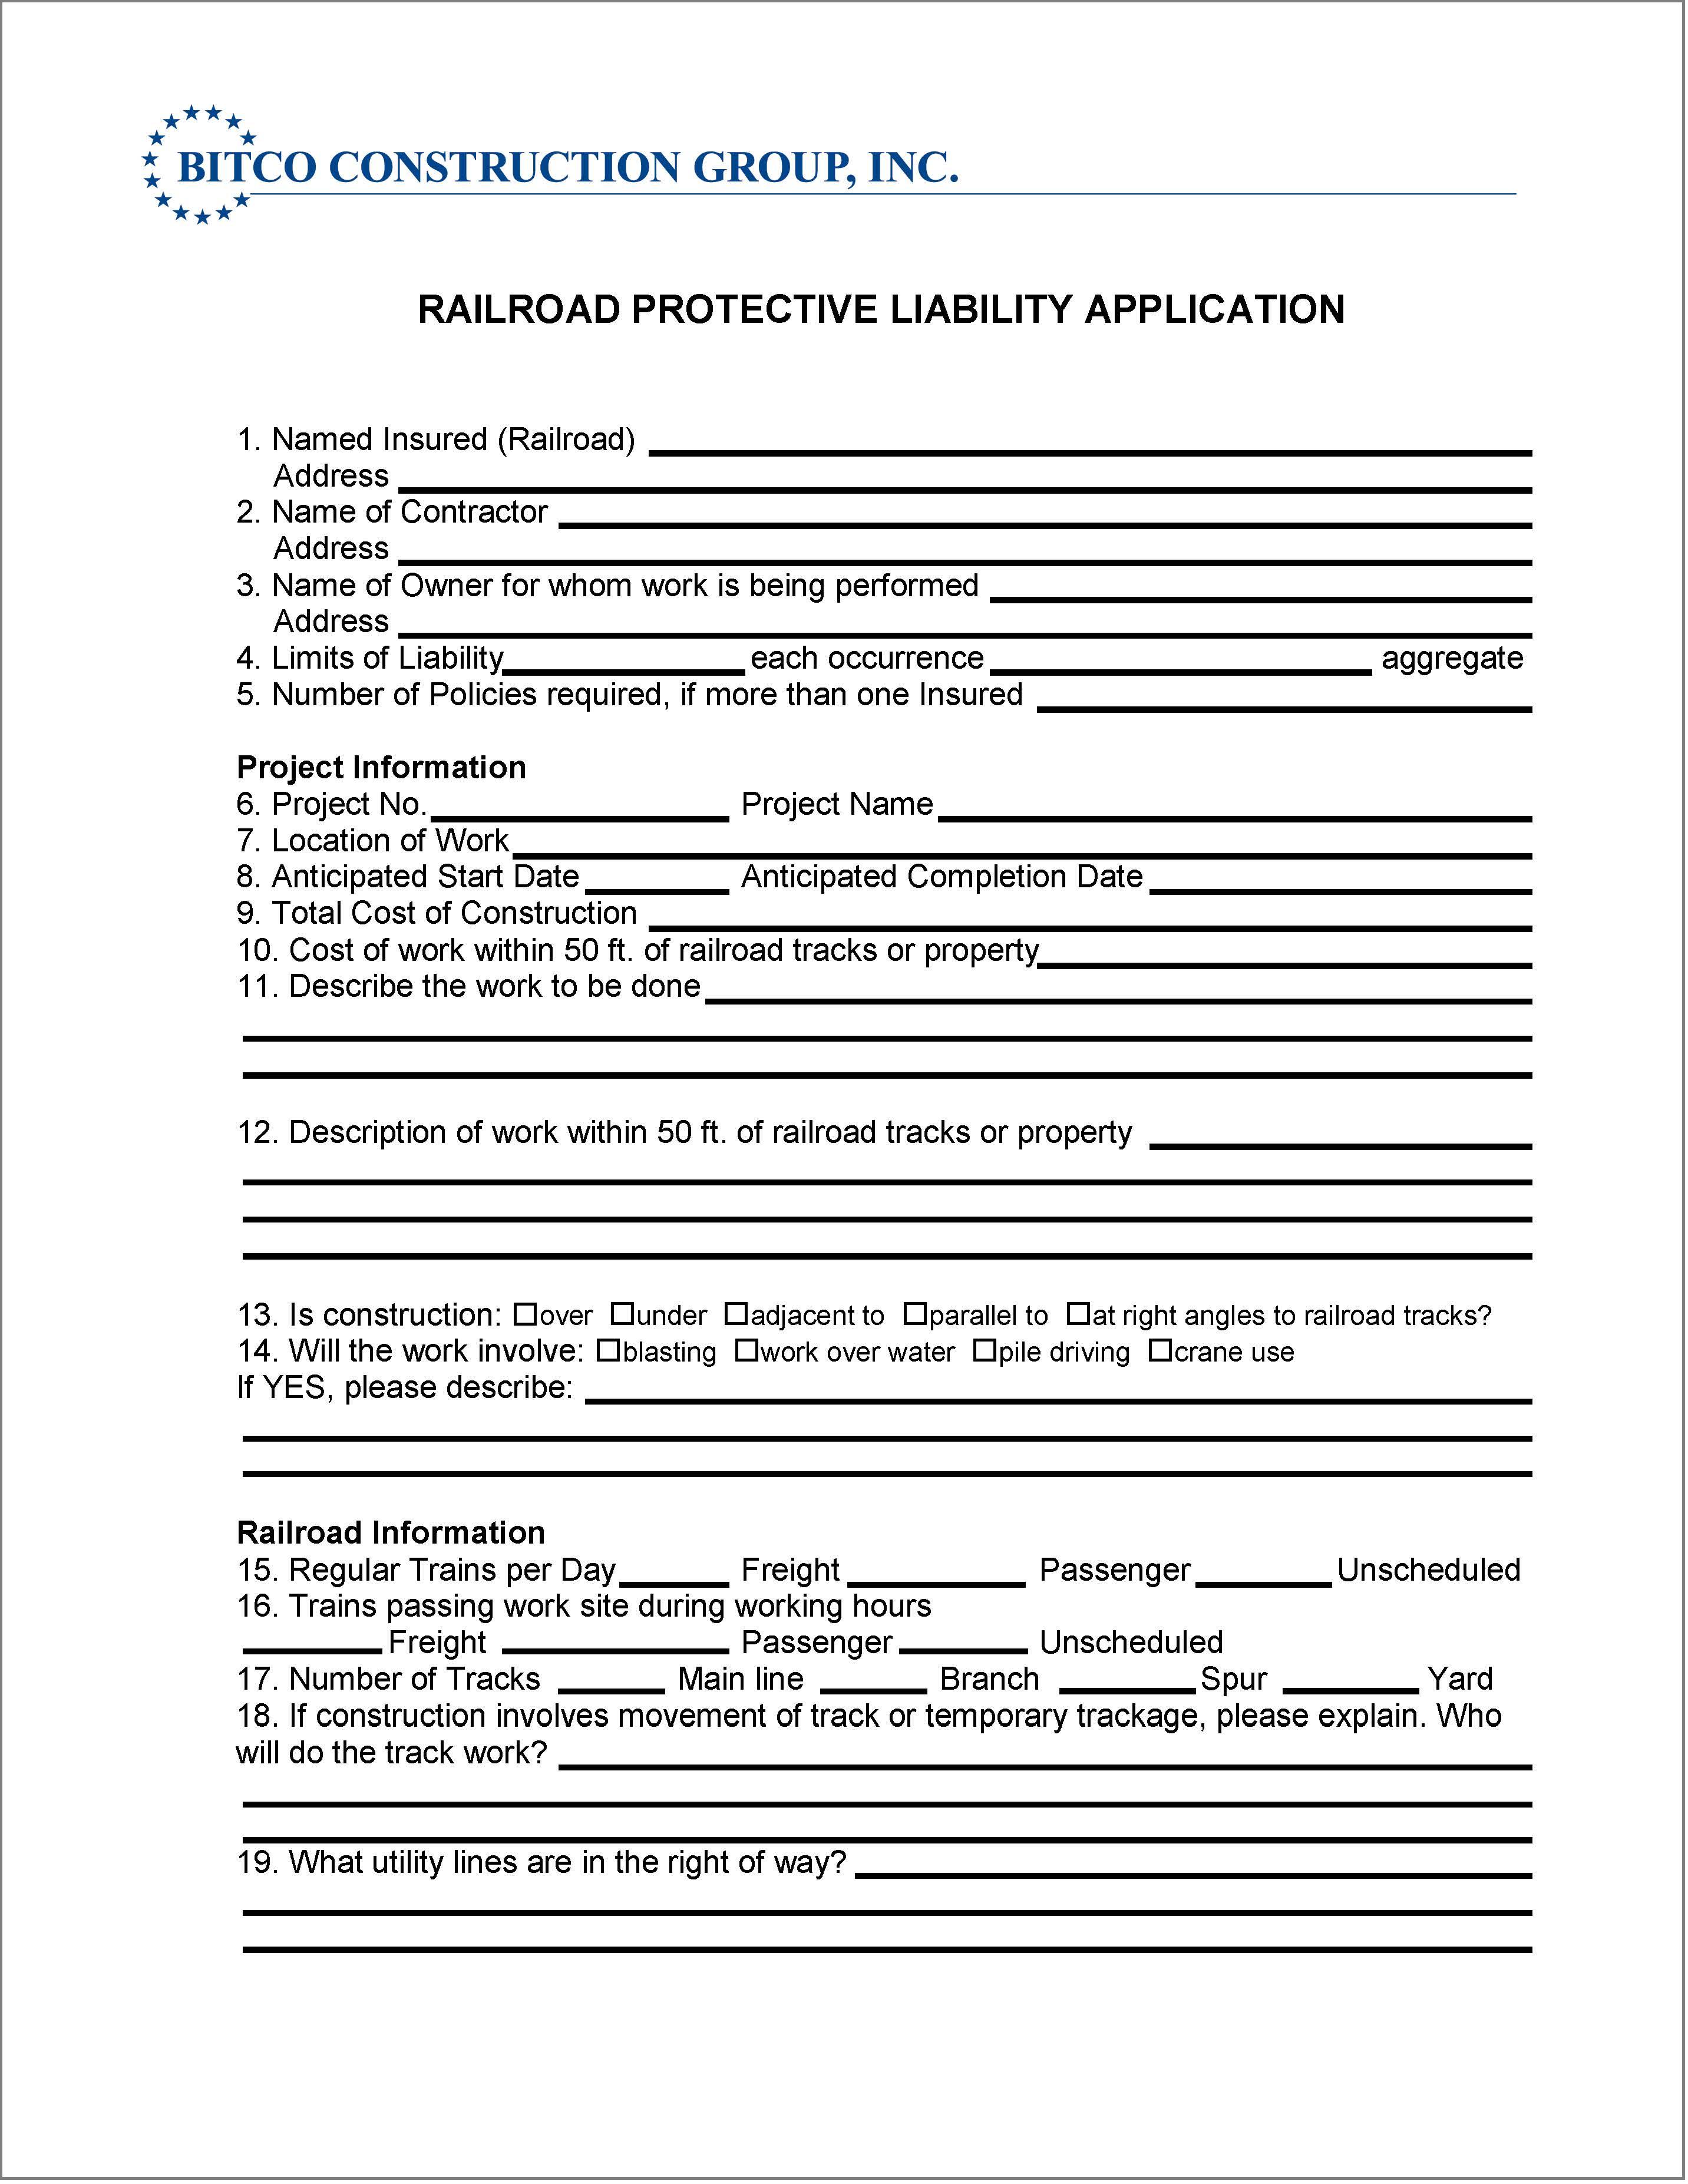 railroad-protective-liability-application